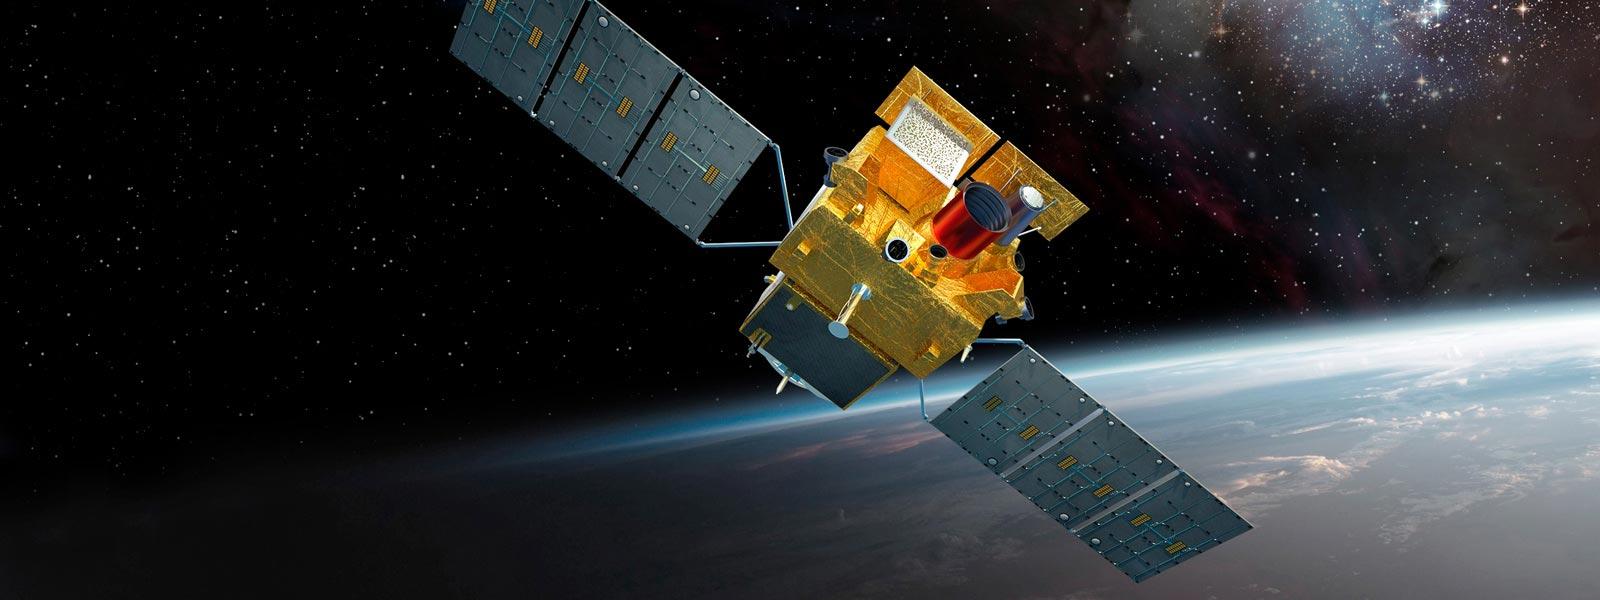 Airstar_Aerospace_satellite_MLI_CNES_s